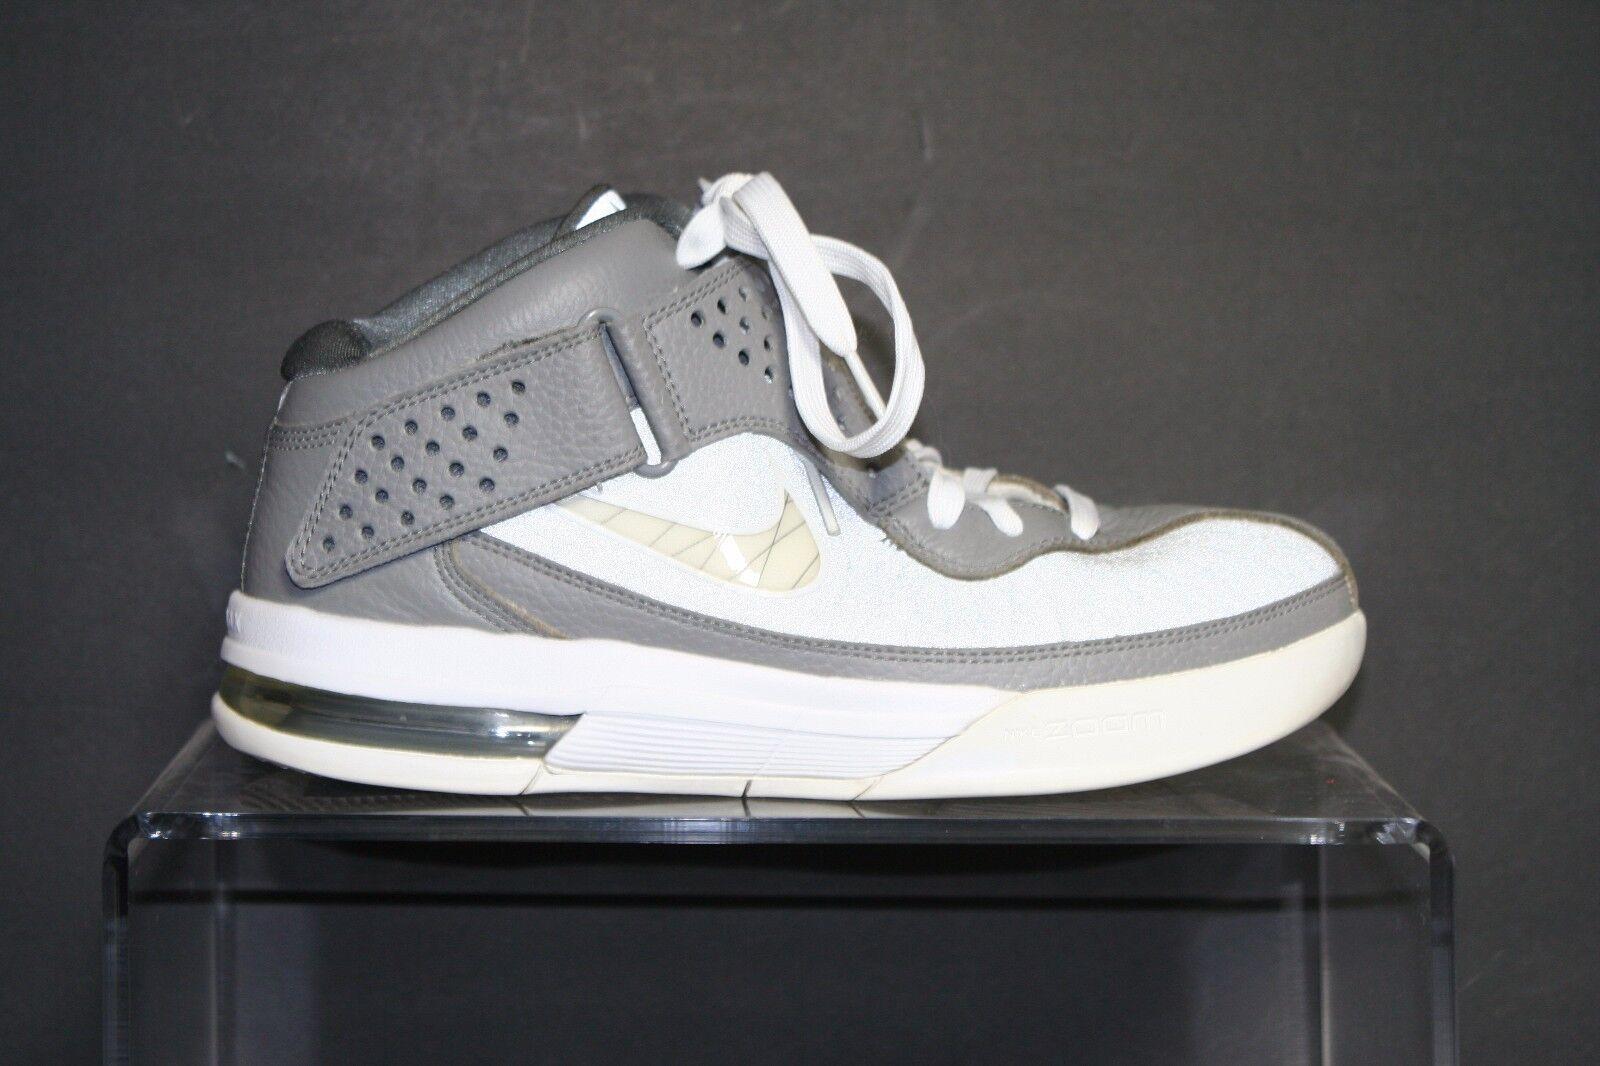 Nike zoom lebron soldato / 5 2011 - cool grey bianchi 8 atletico cavs nba